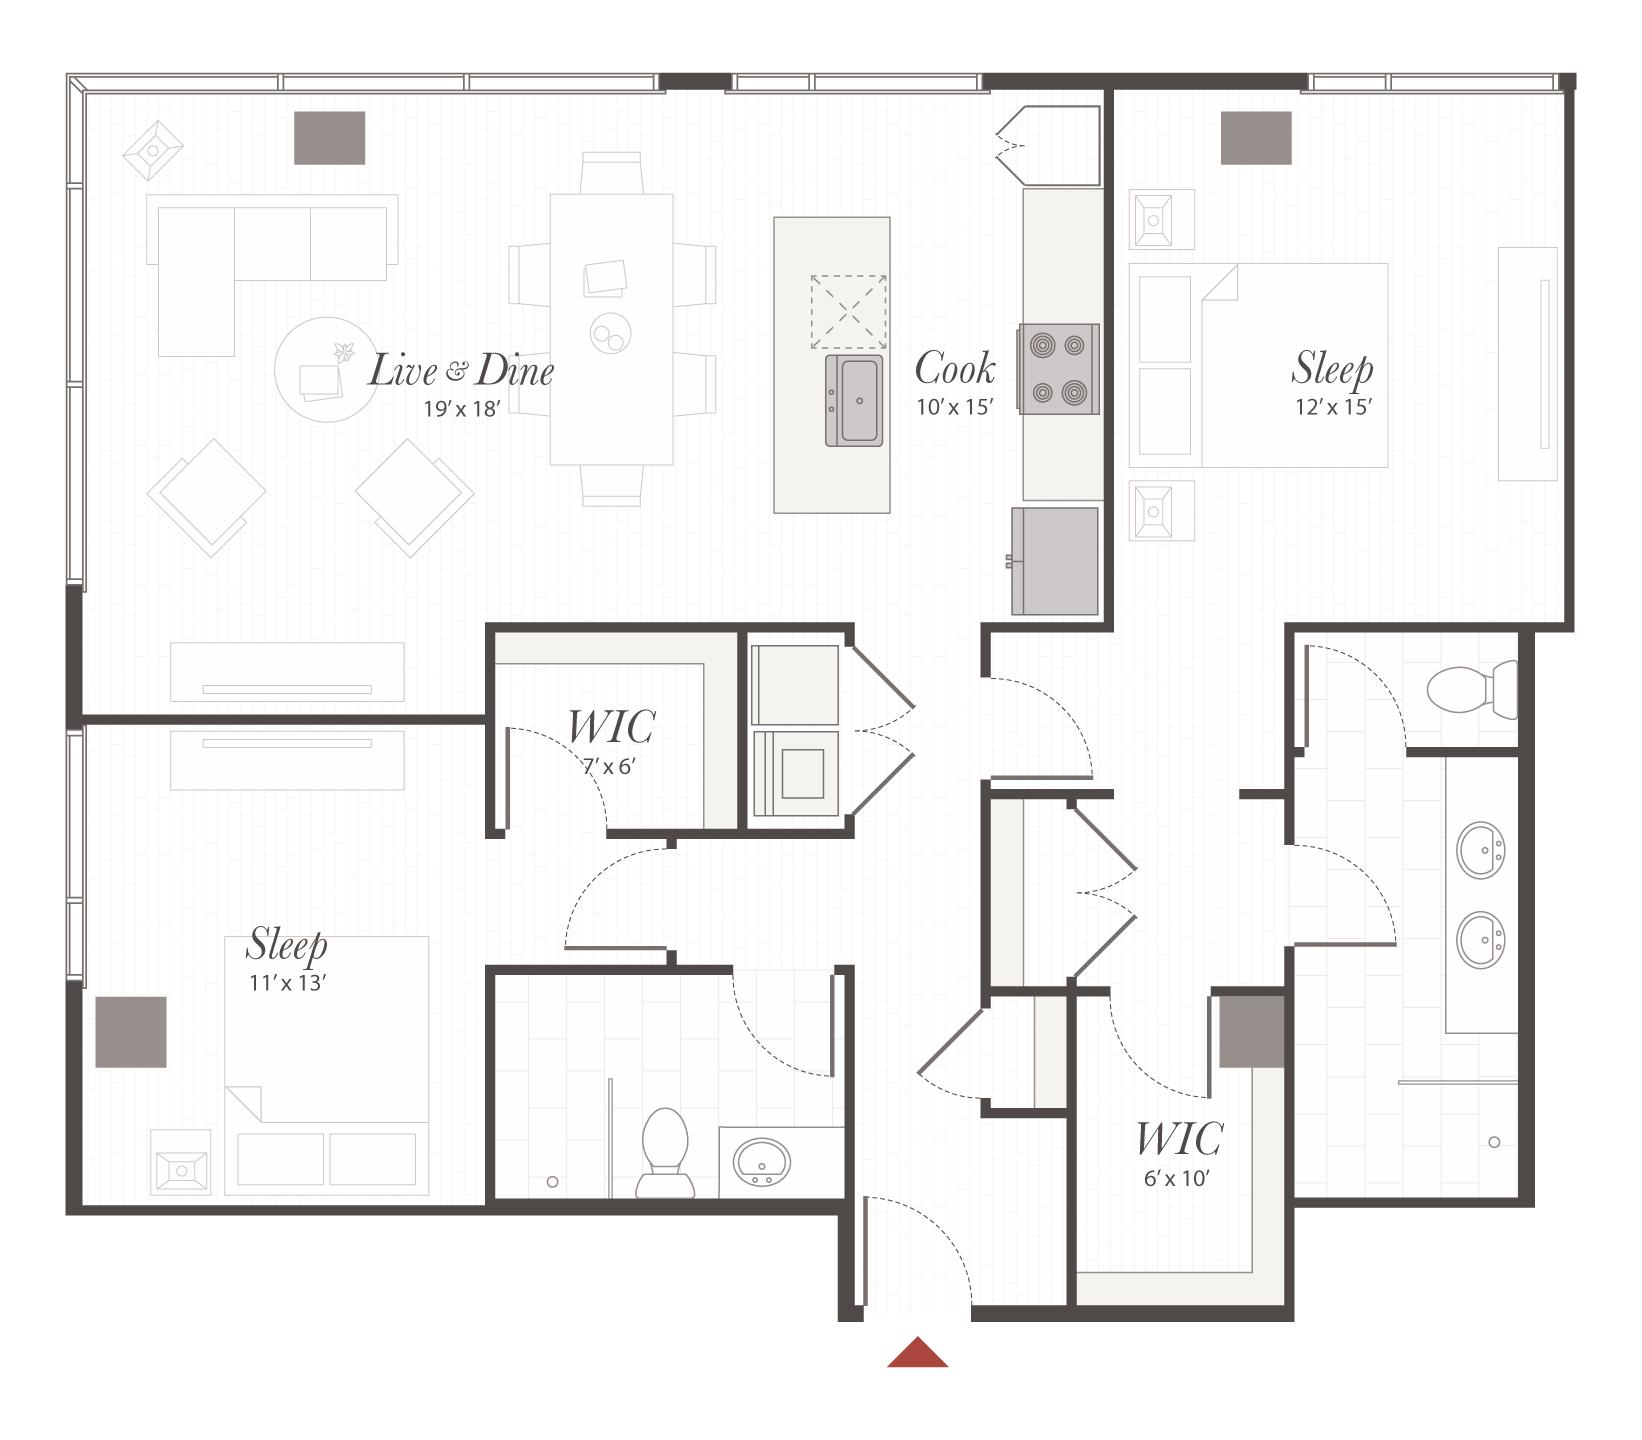 X2 - 2 Bedroom Apartment Cincinnati